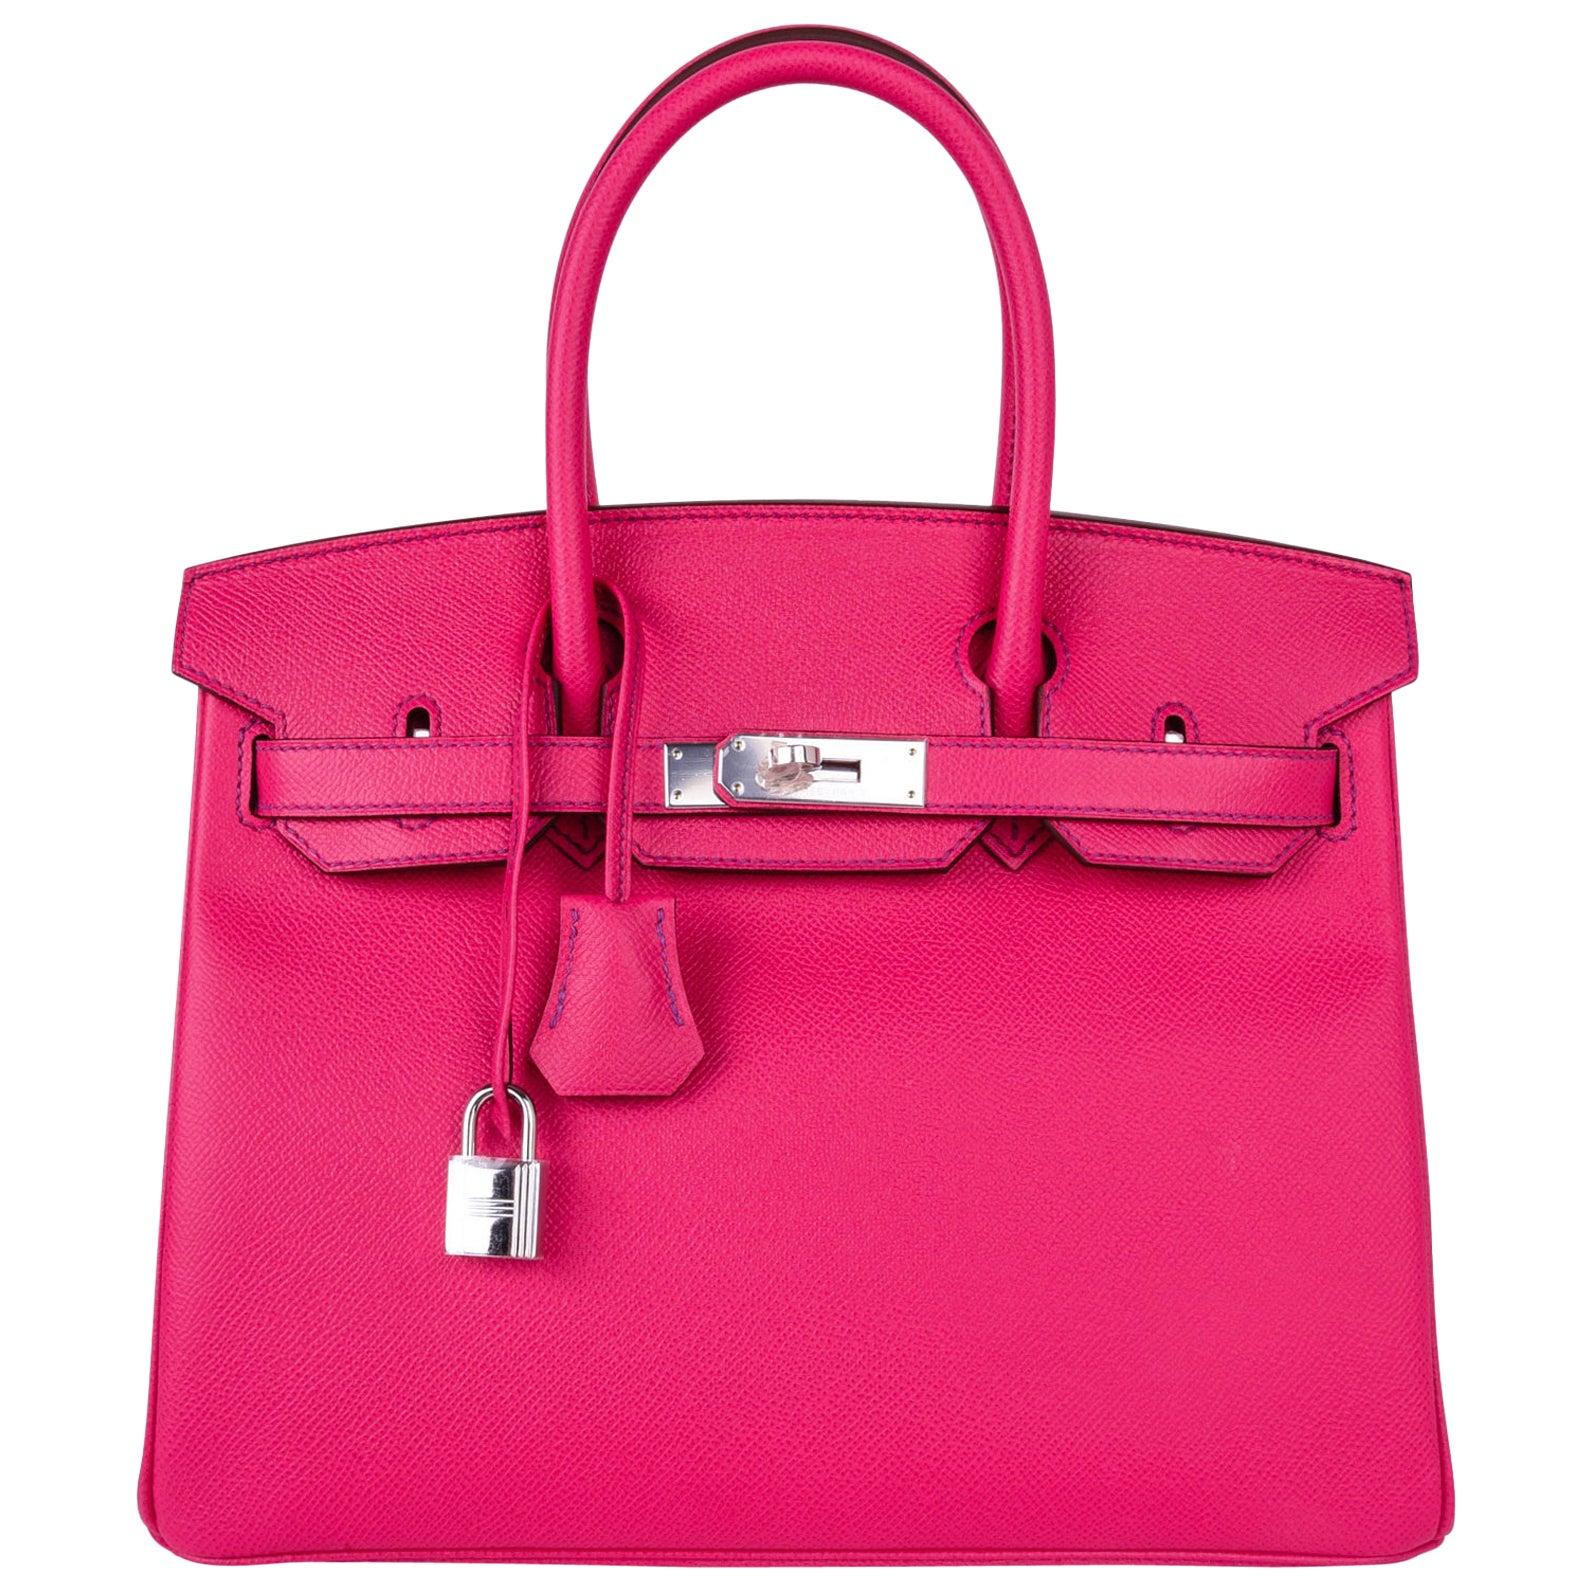 Hermes Birkin 30 Bag HSS Pink Rose Tyrien / Blue Paon Palladium Special Order